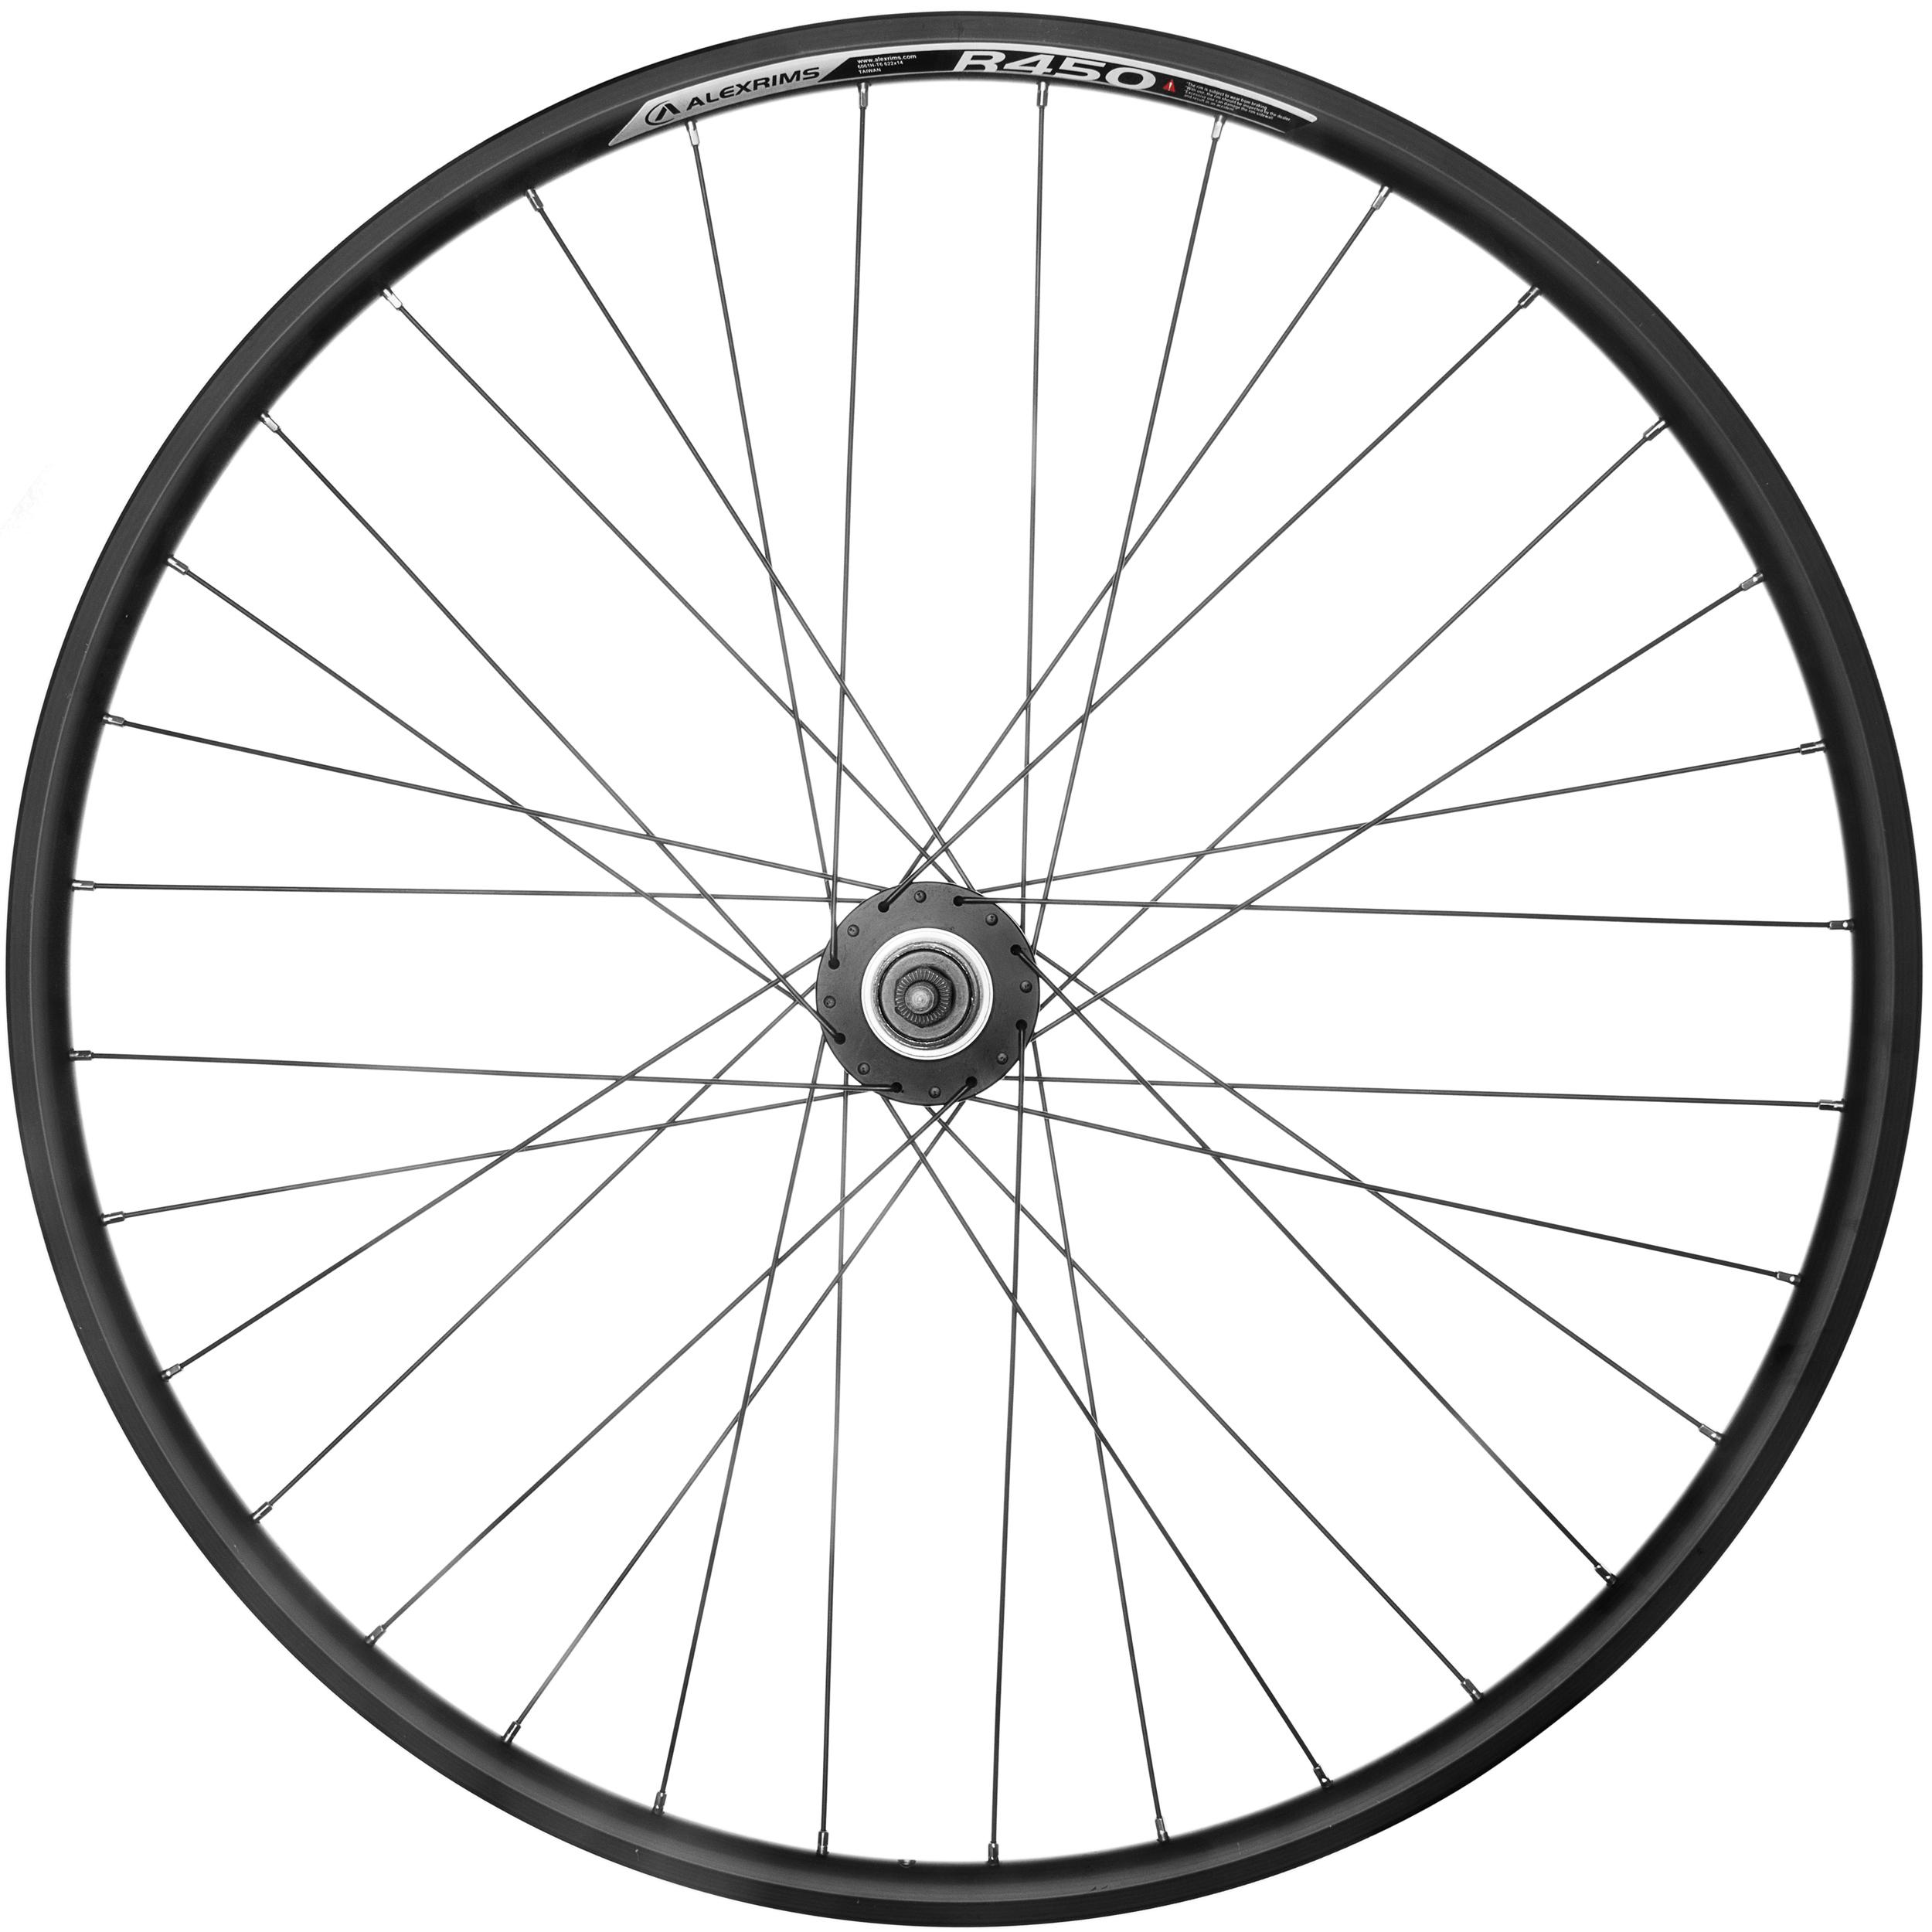 It is an image of Divine Bike Wheel Drawing